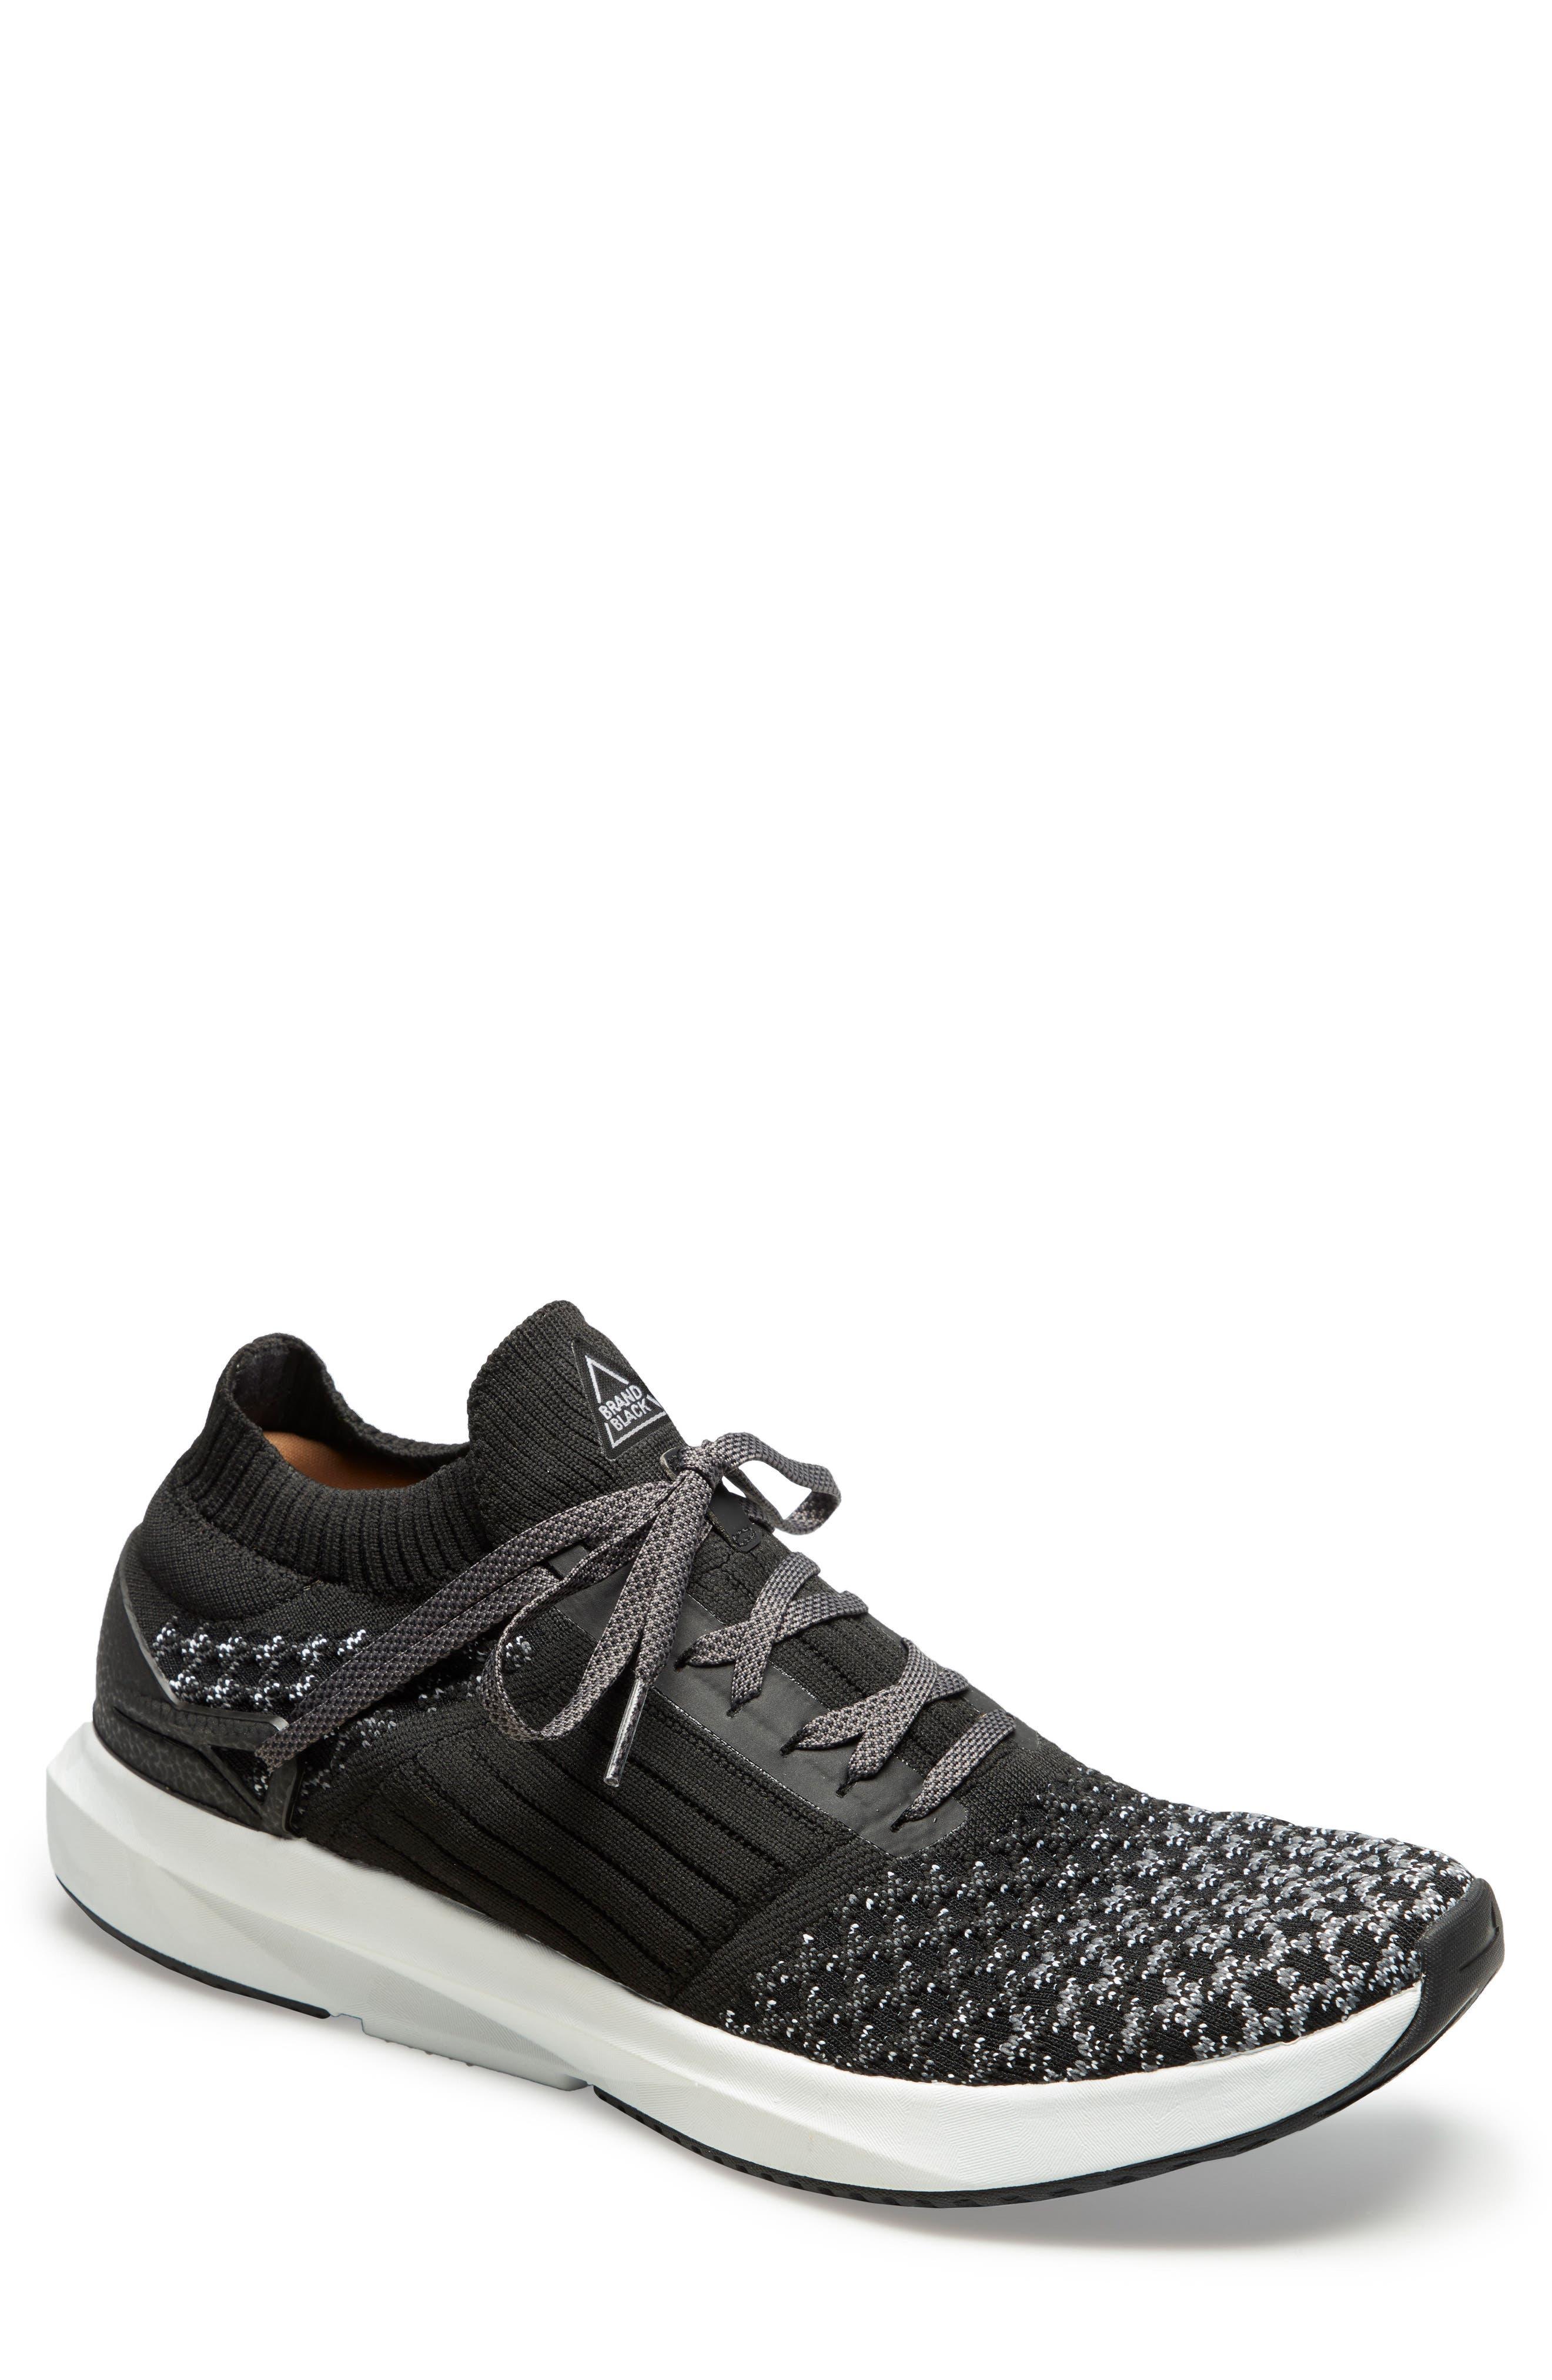 Viento Sneaker,                             Main thumbnail 1, color,                             011